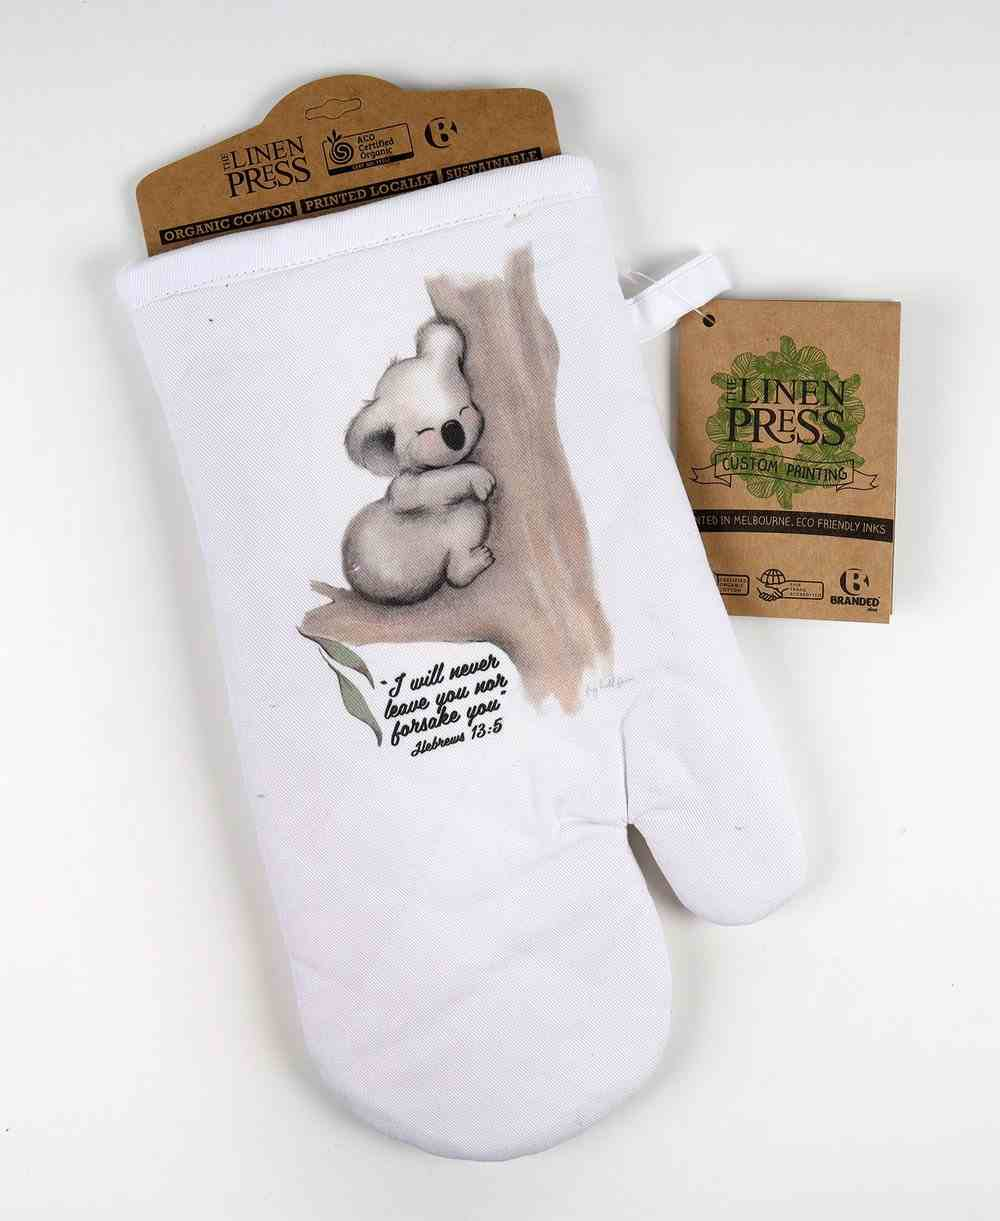 Oven Mitt White Fig Hill Farm Faith Koala Comfort (Hebrews 13: 5) (Australiana Products Series) Soft Goods